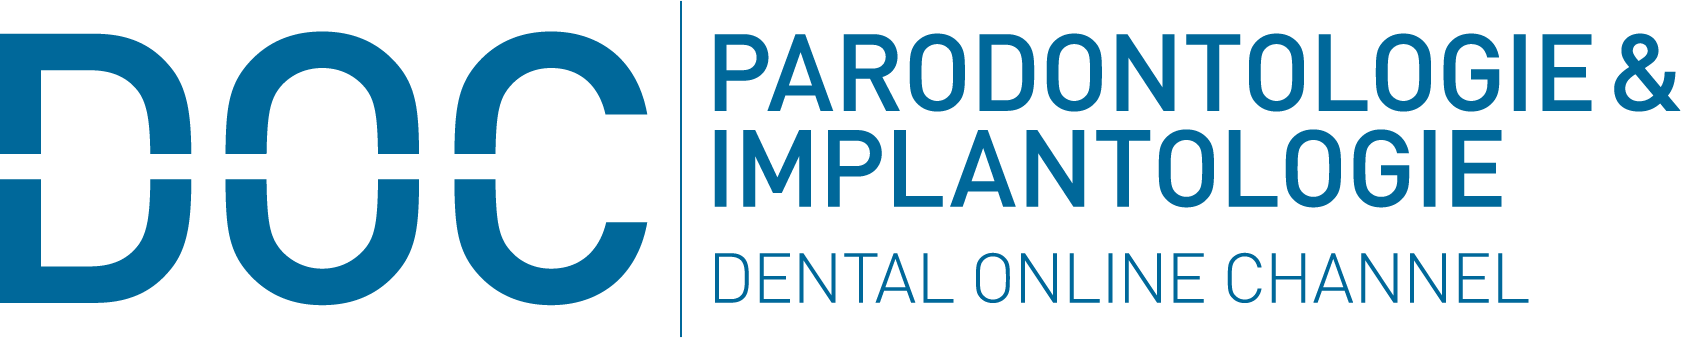 DOC Dental Online Channel Logo